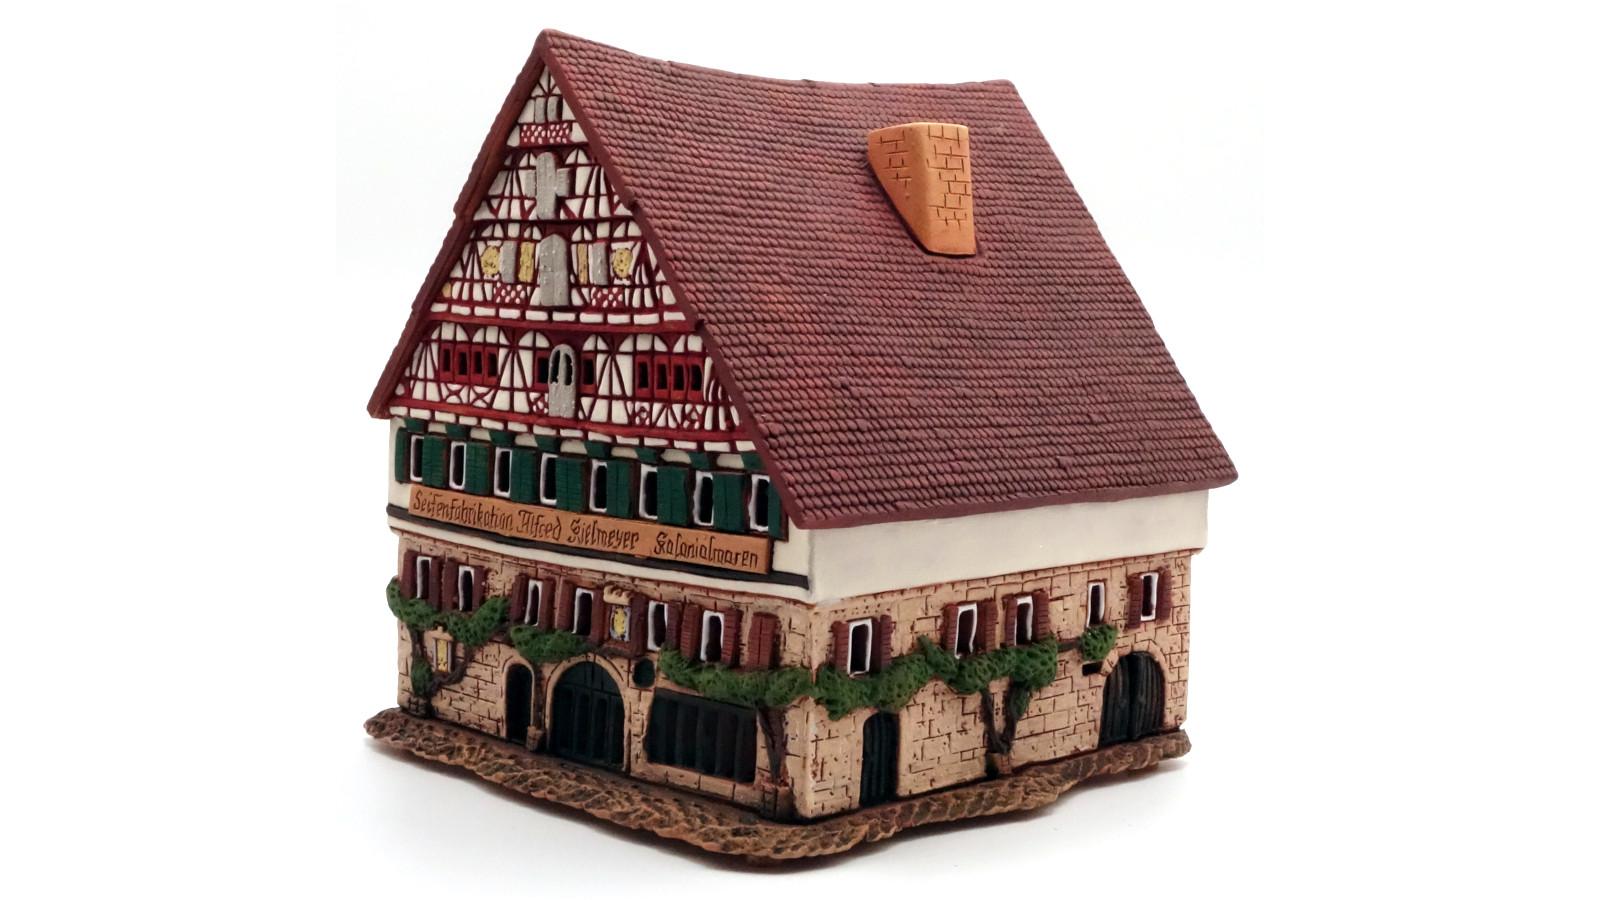 Kielmeyer Haus Esslingen Lichthaus